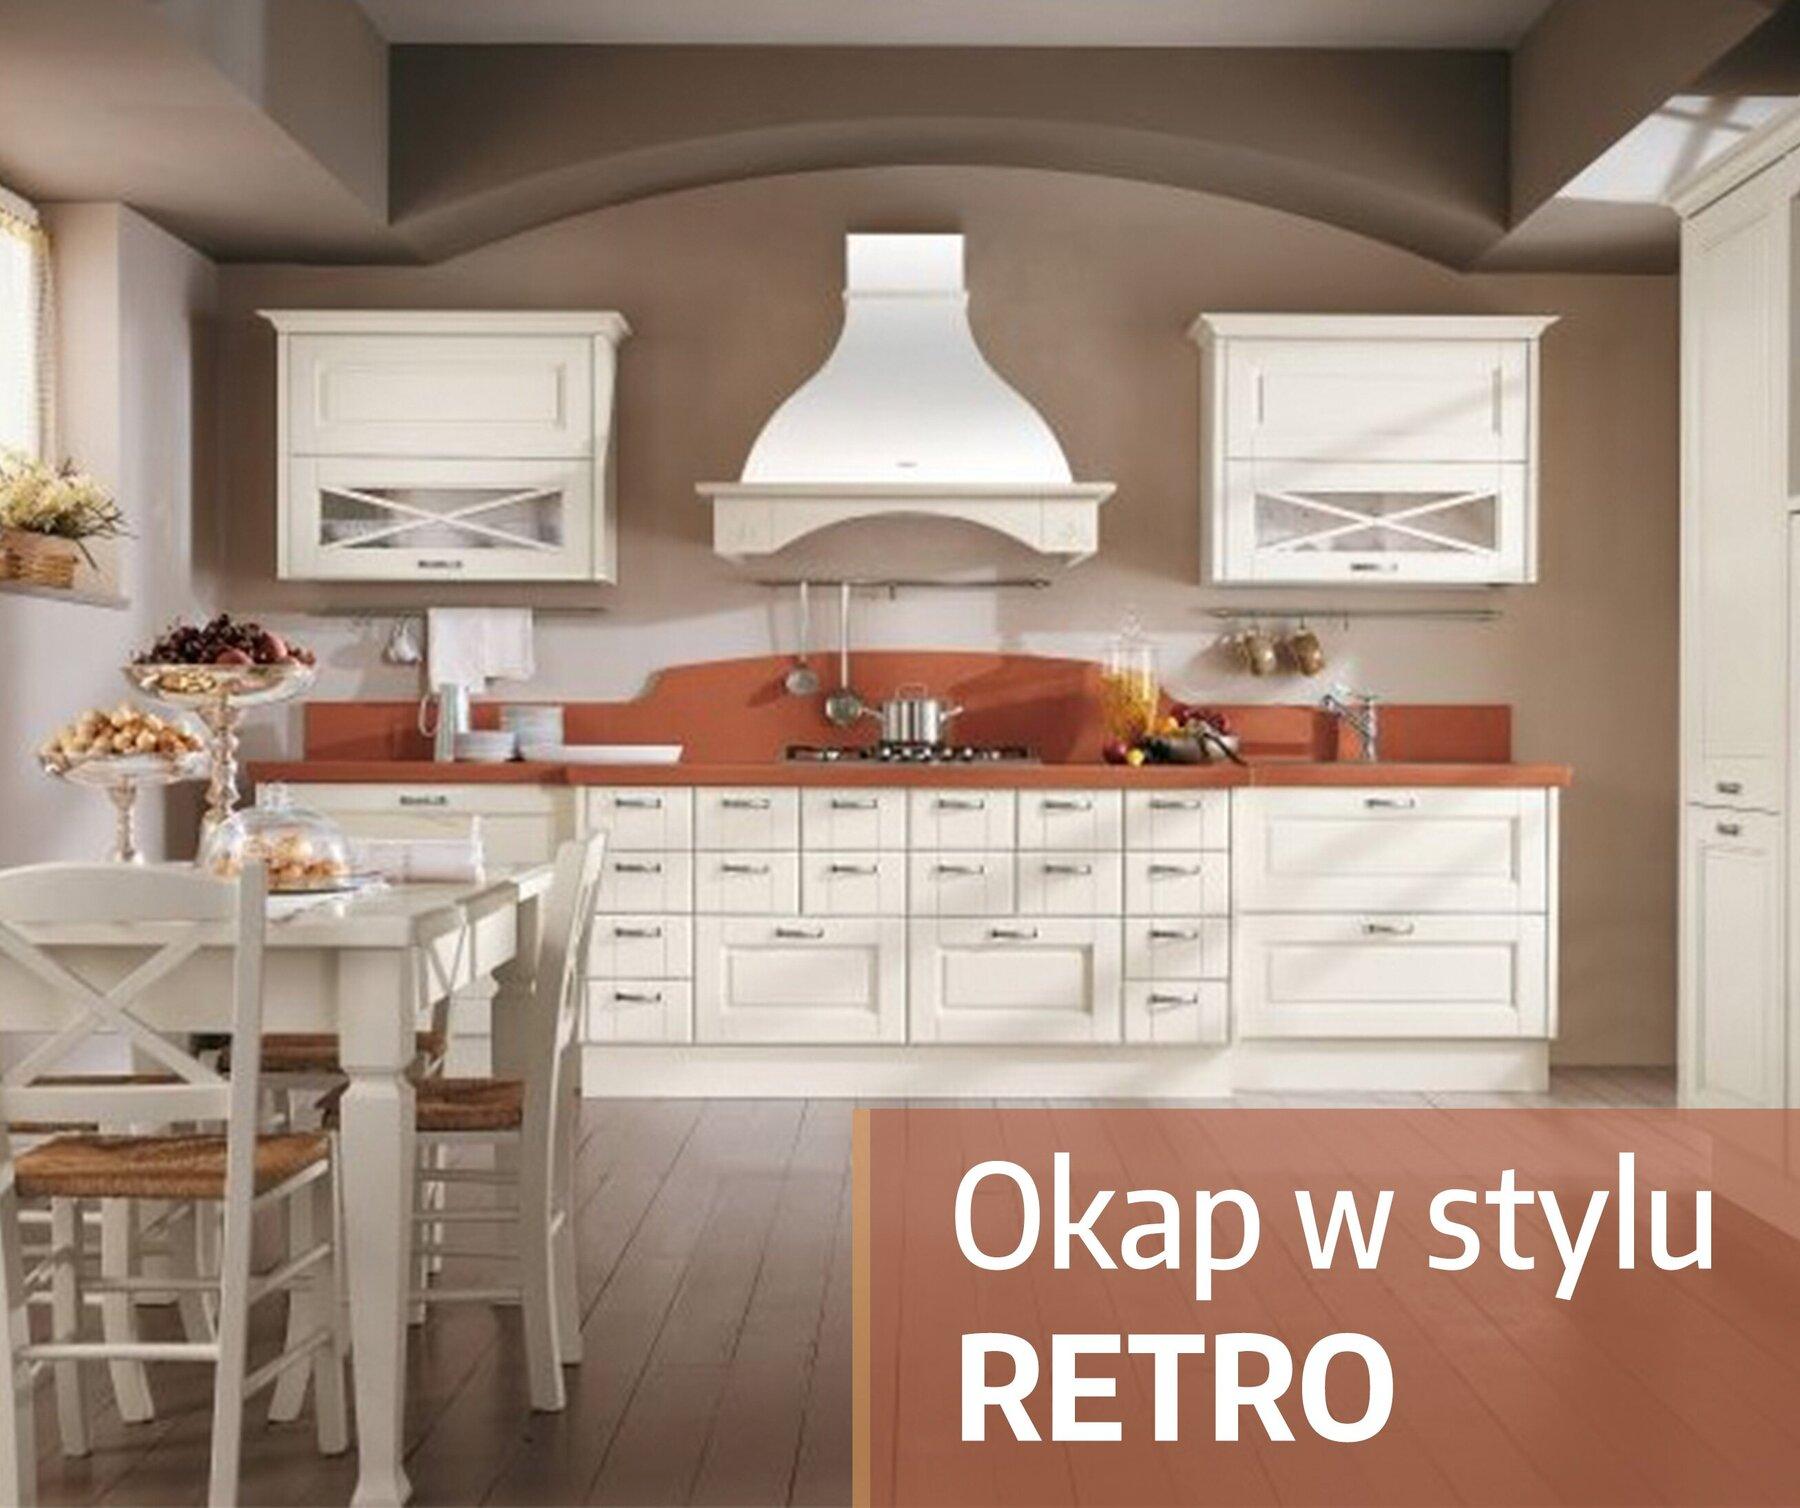 Okap Retro Wydajnosc I Design Sklep Okapykuchenne Pl